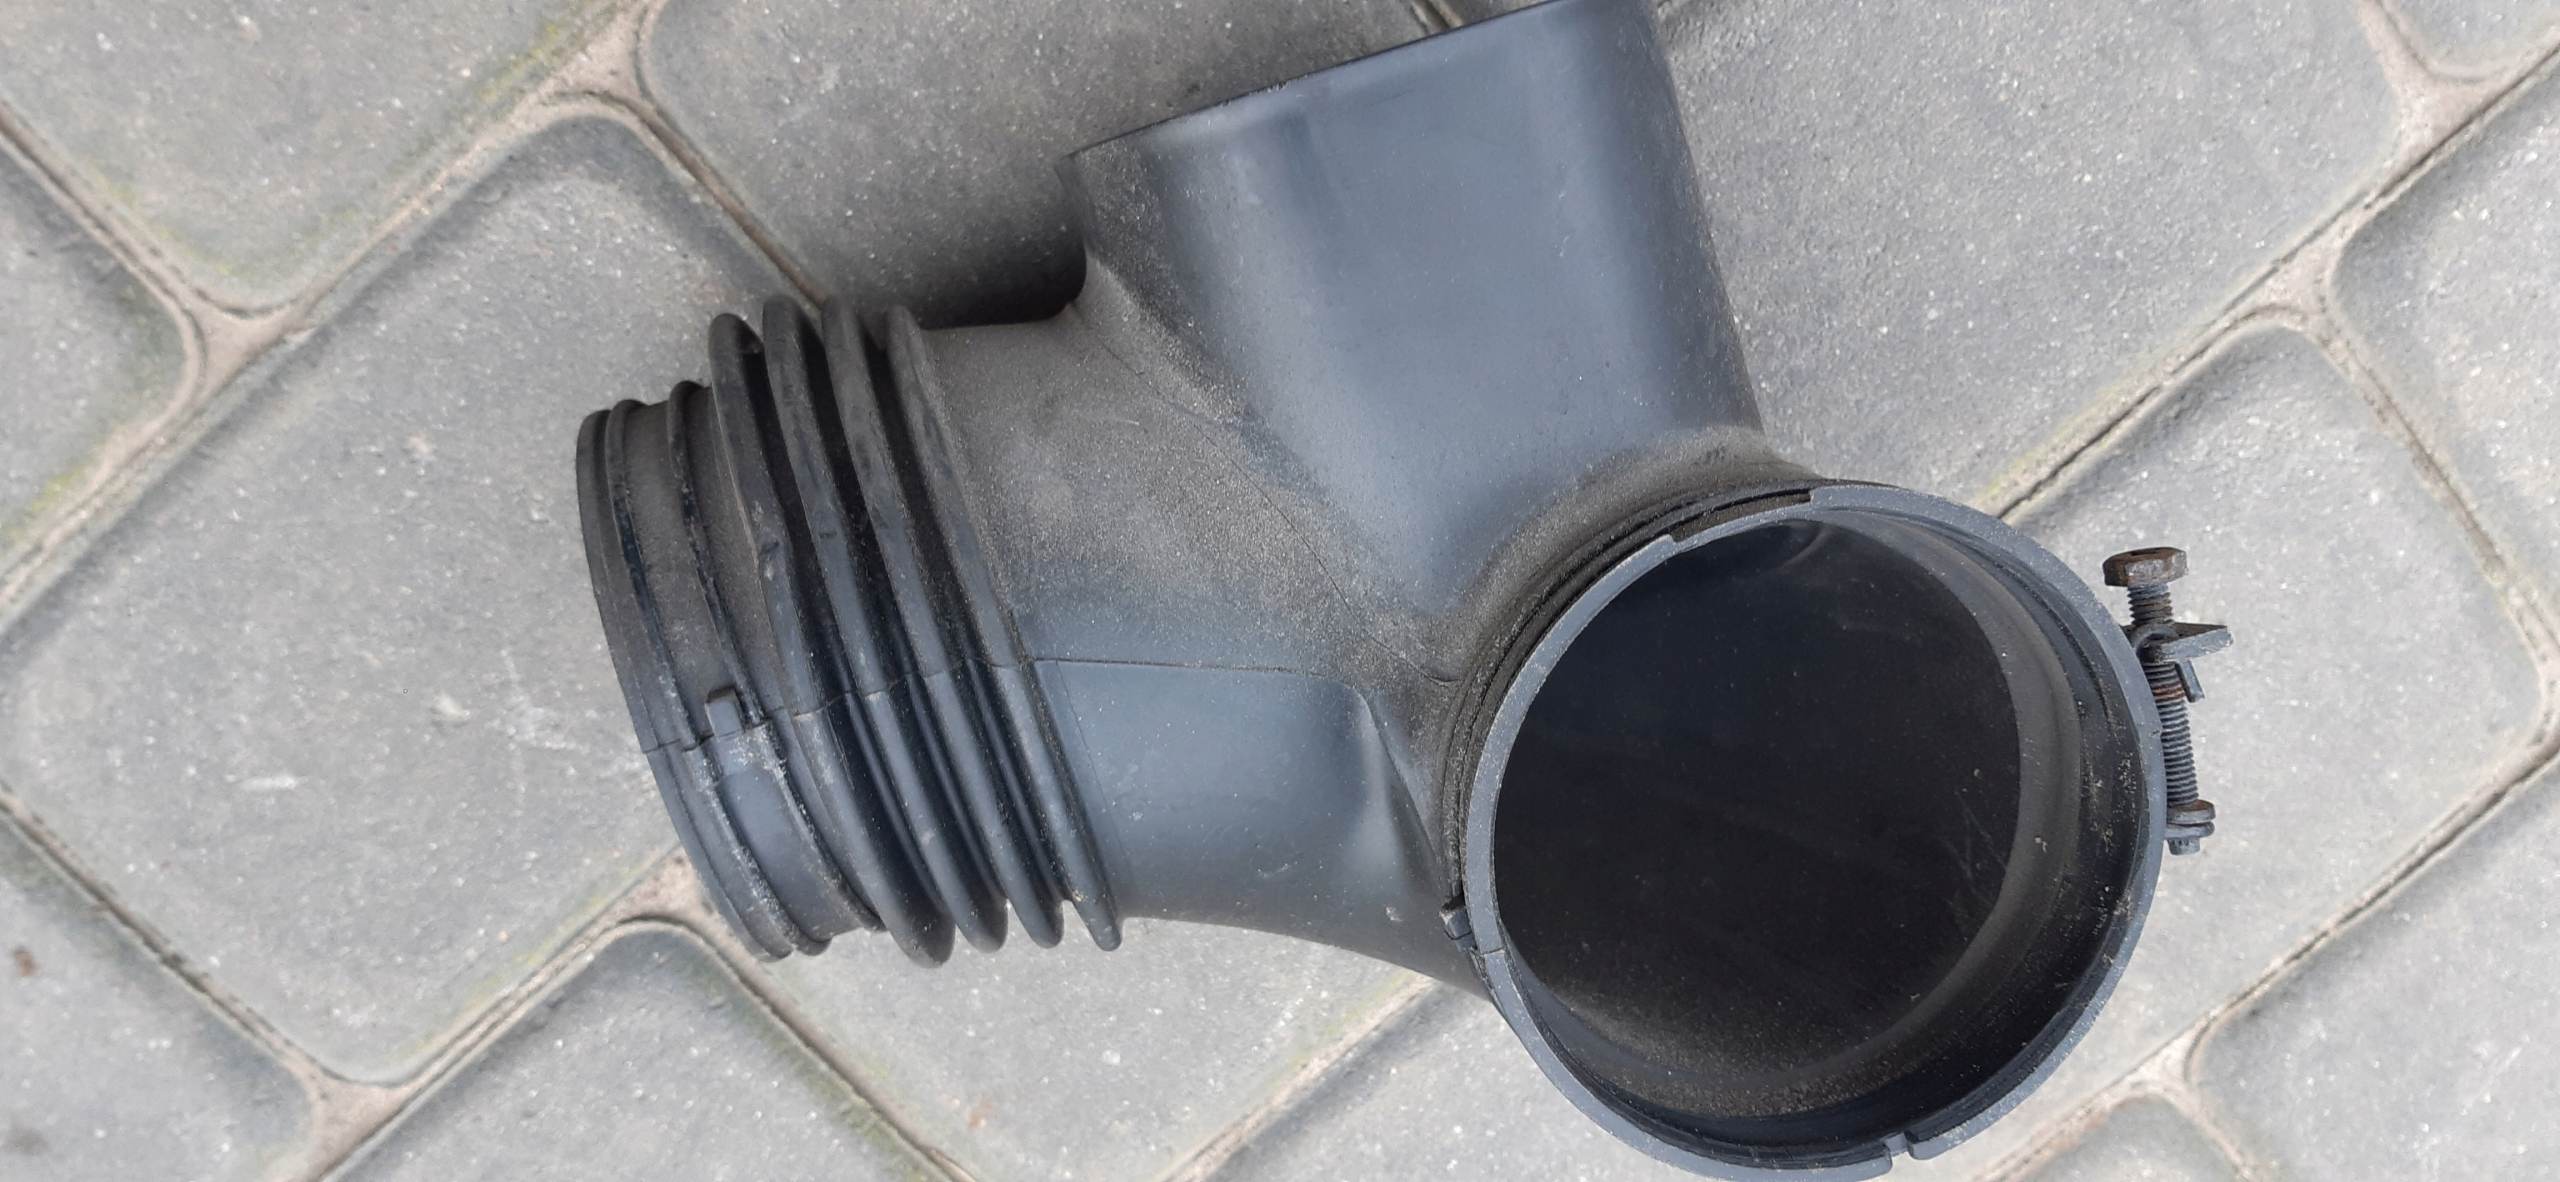 Kia Sorento 3.3 V6 Rura Przewód 2